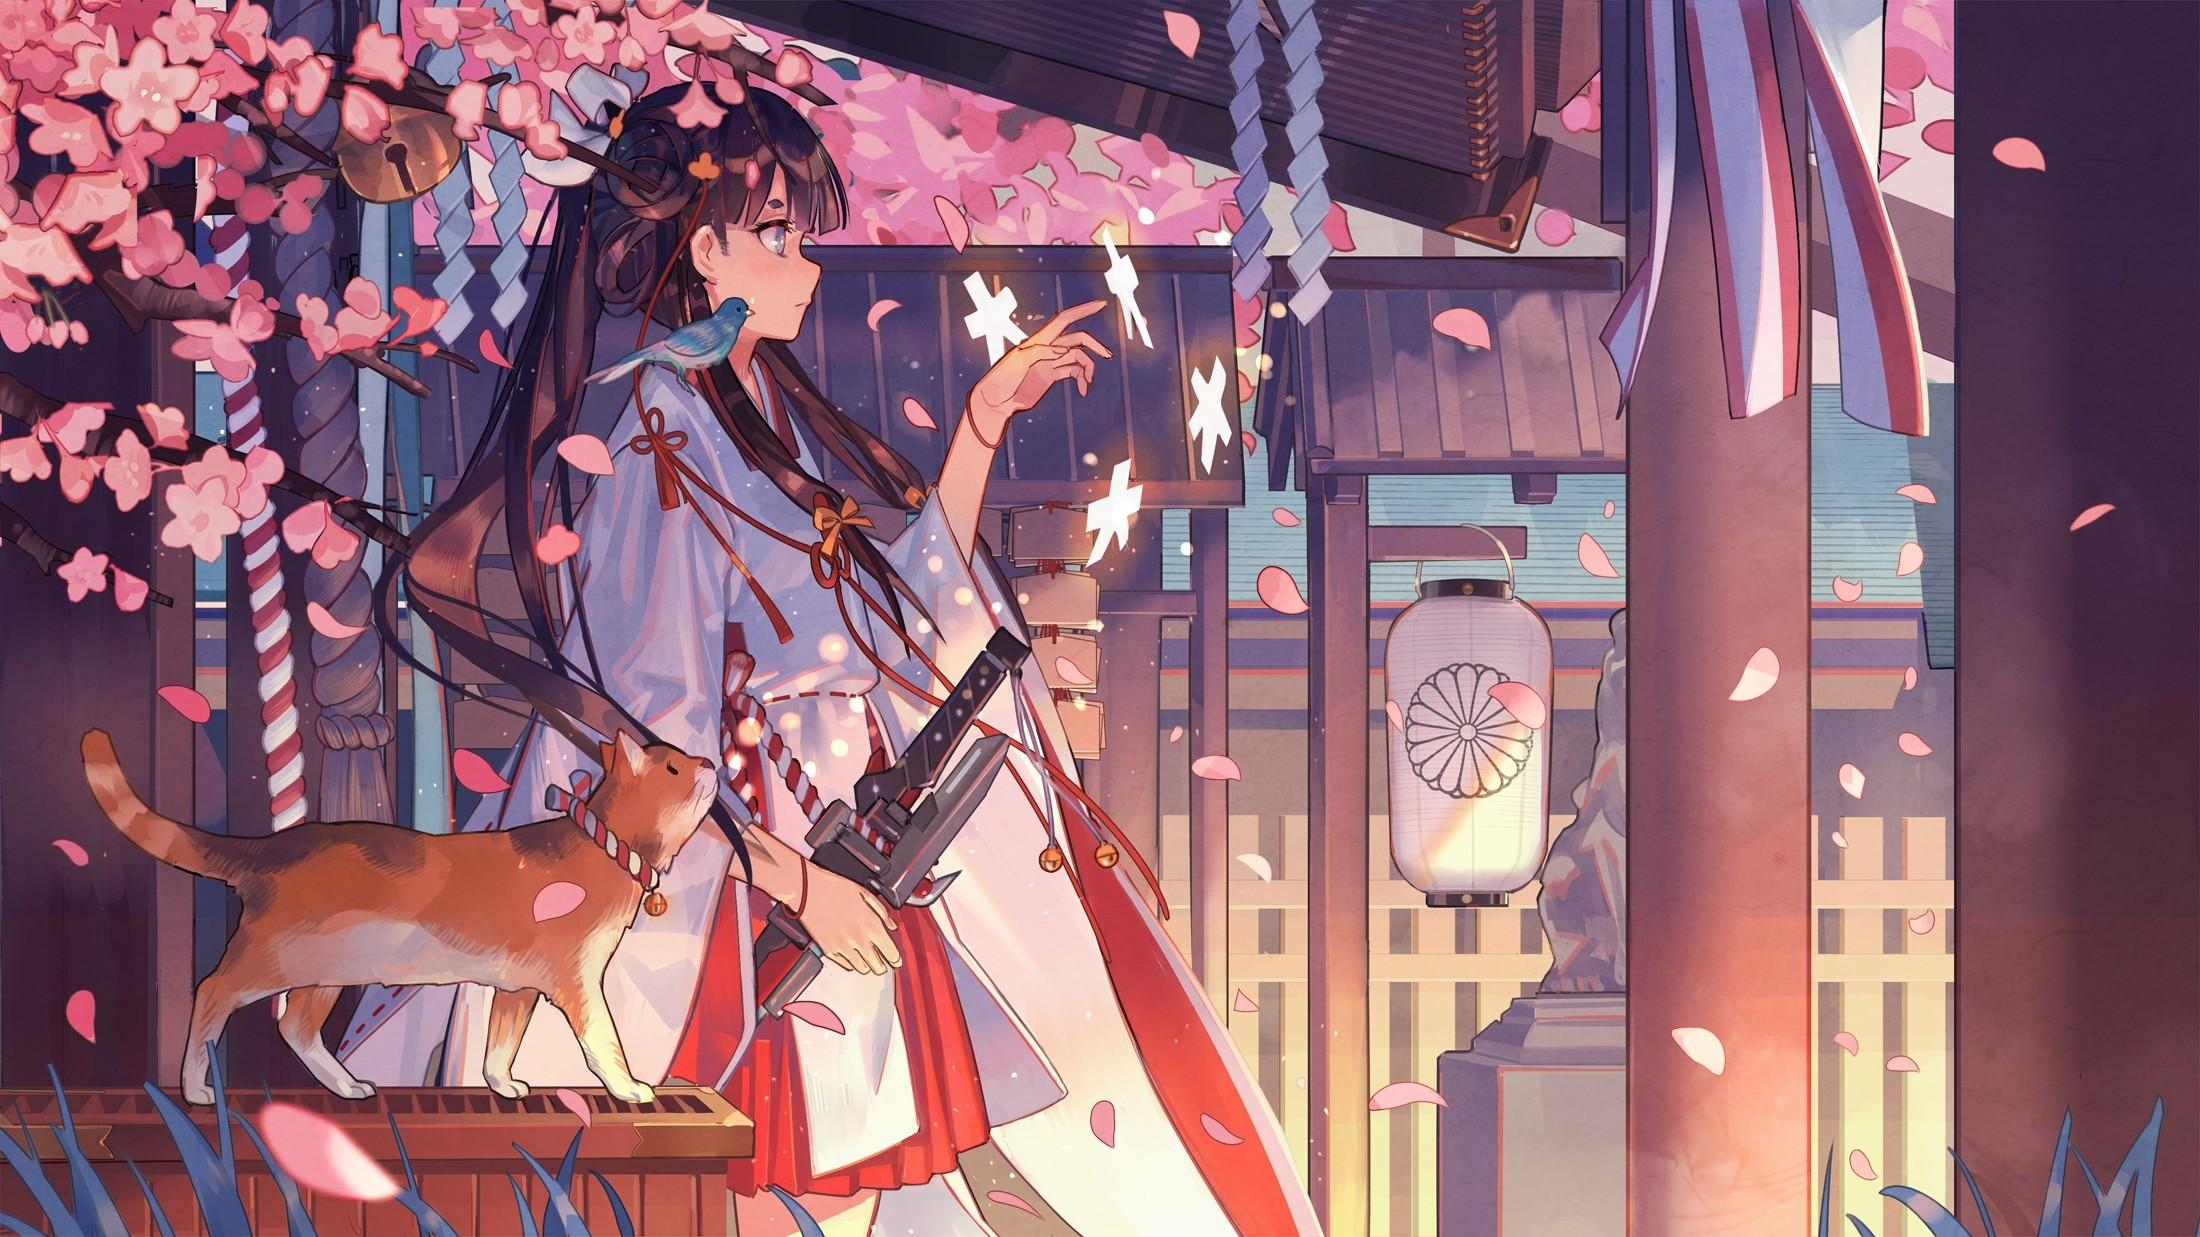 Res: 2200x1237, cherry-blossom-sakura-tree-schoolgirl-petals-japan-shinkai- · kimono  wallpapers | WallpaperUP